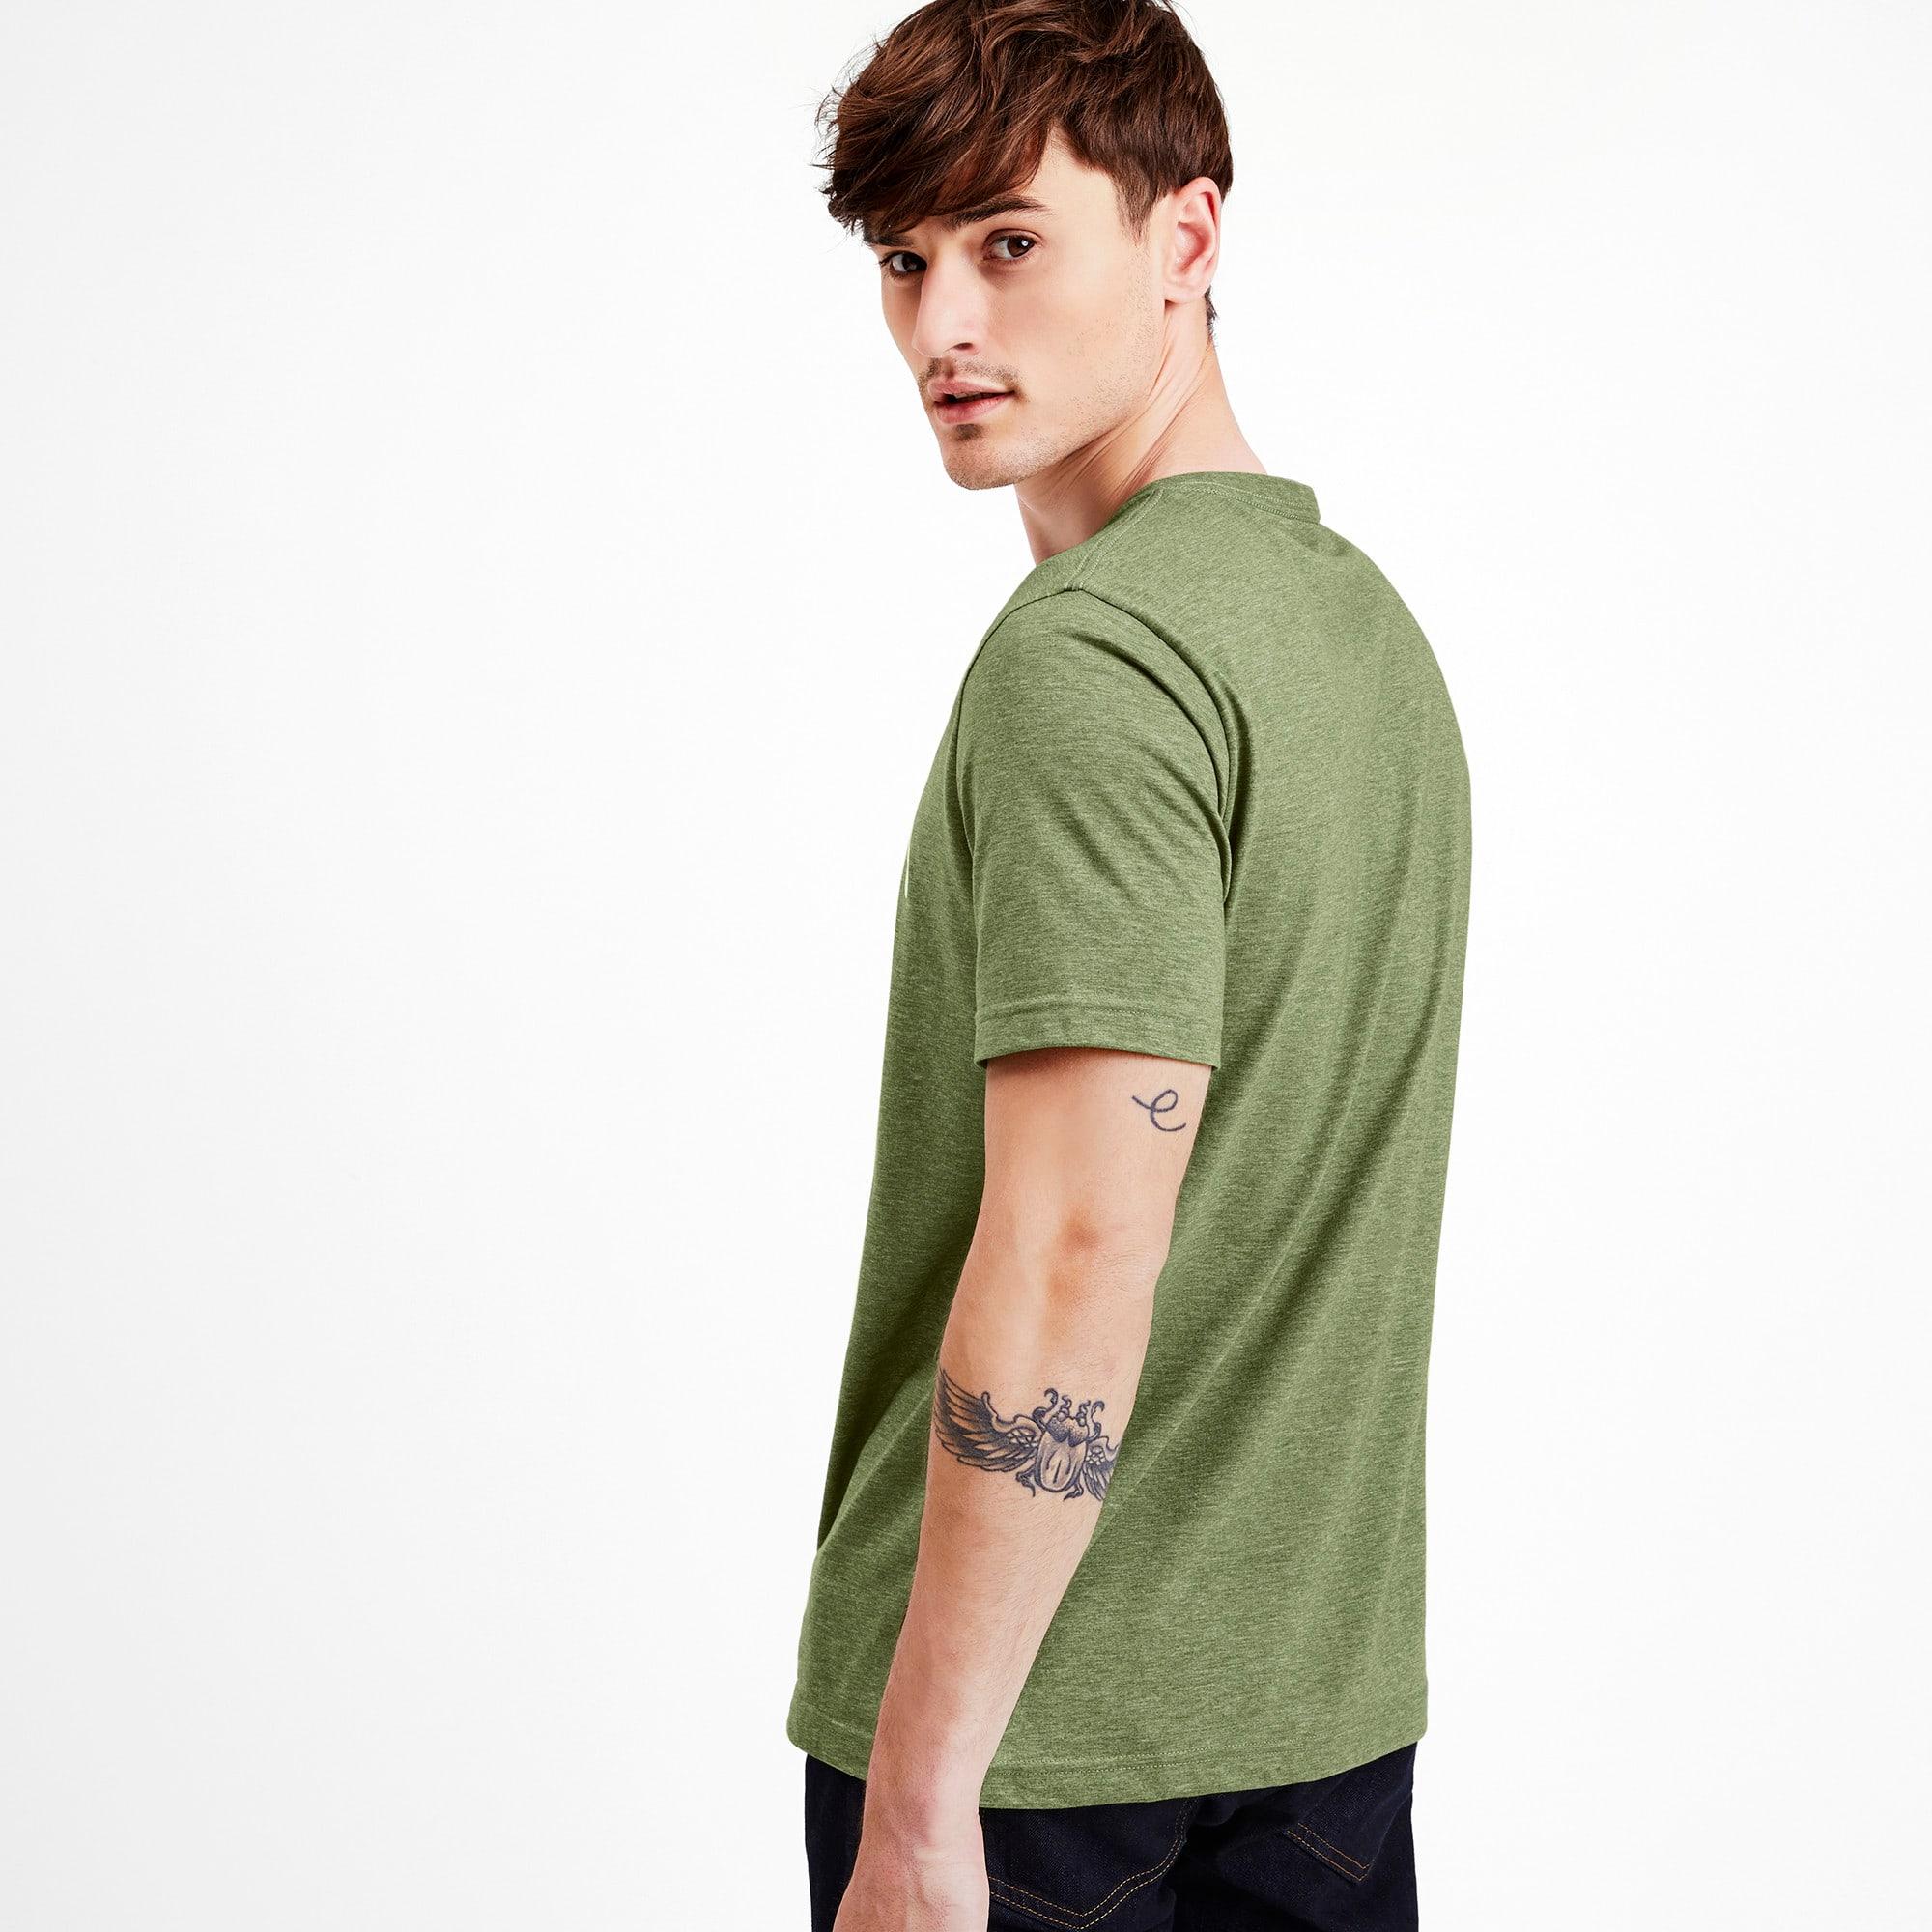 Thumbnail 2 of Indispensabili+ T-shirt mélange uomo, Garden Green Heather, medium